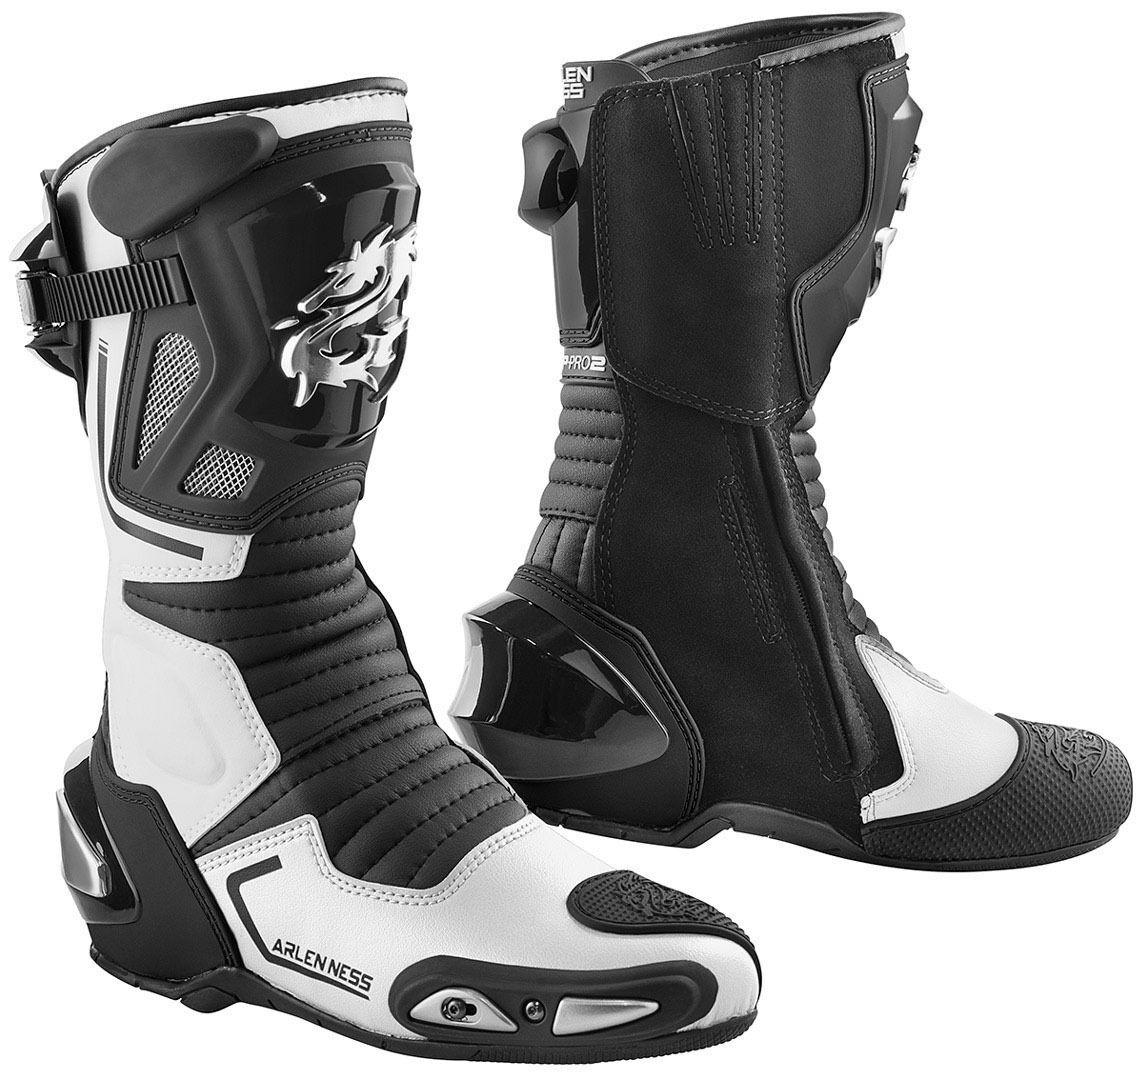 Arlen Ness Sugello Bottes de moto Noir Blanc taille : 46